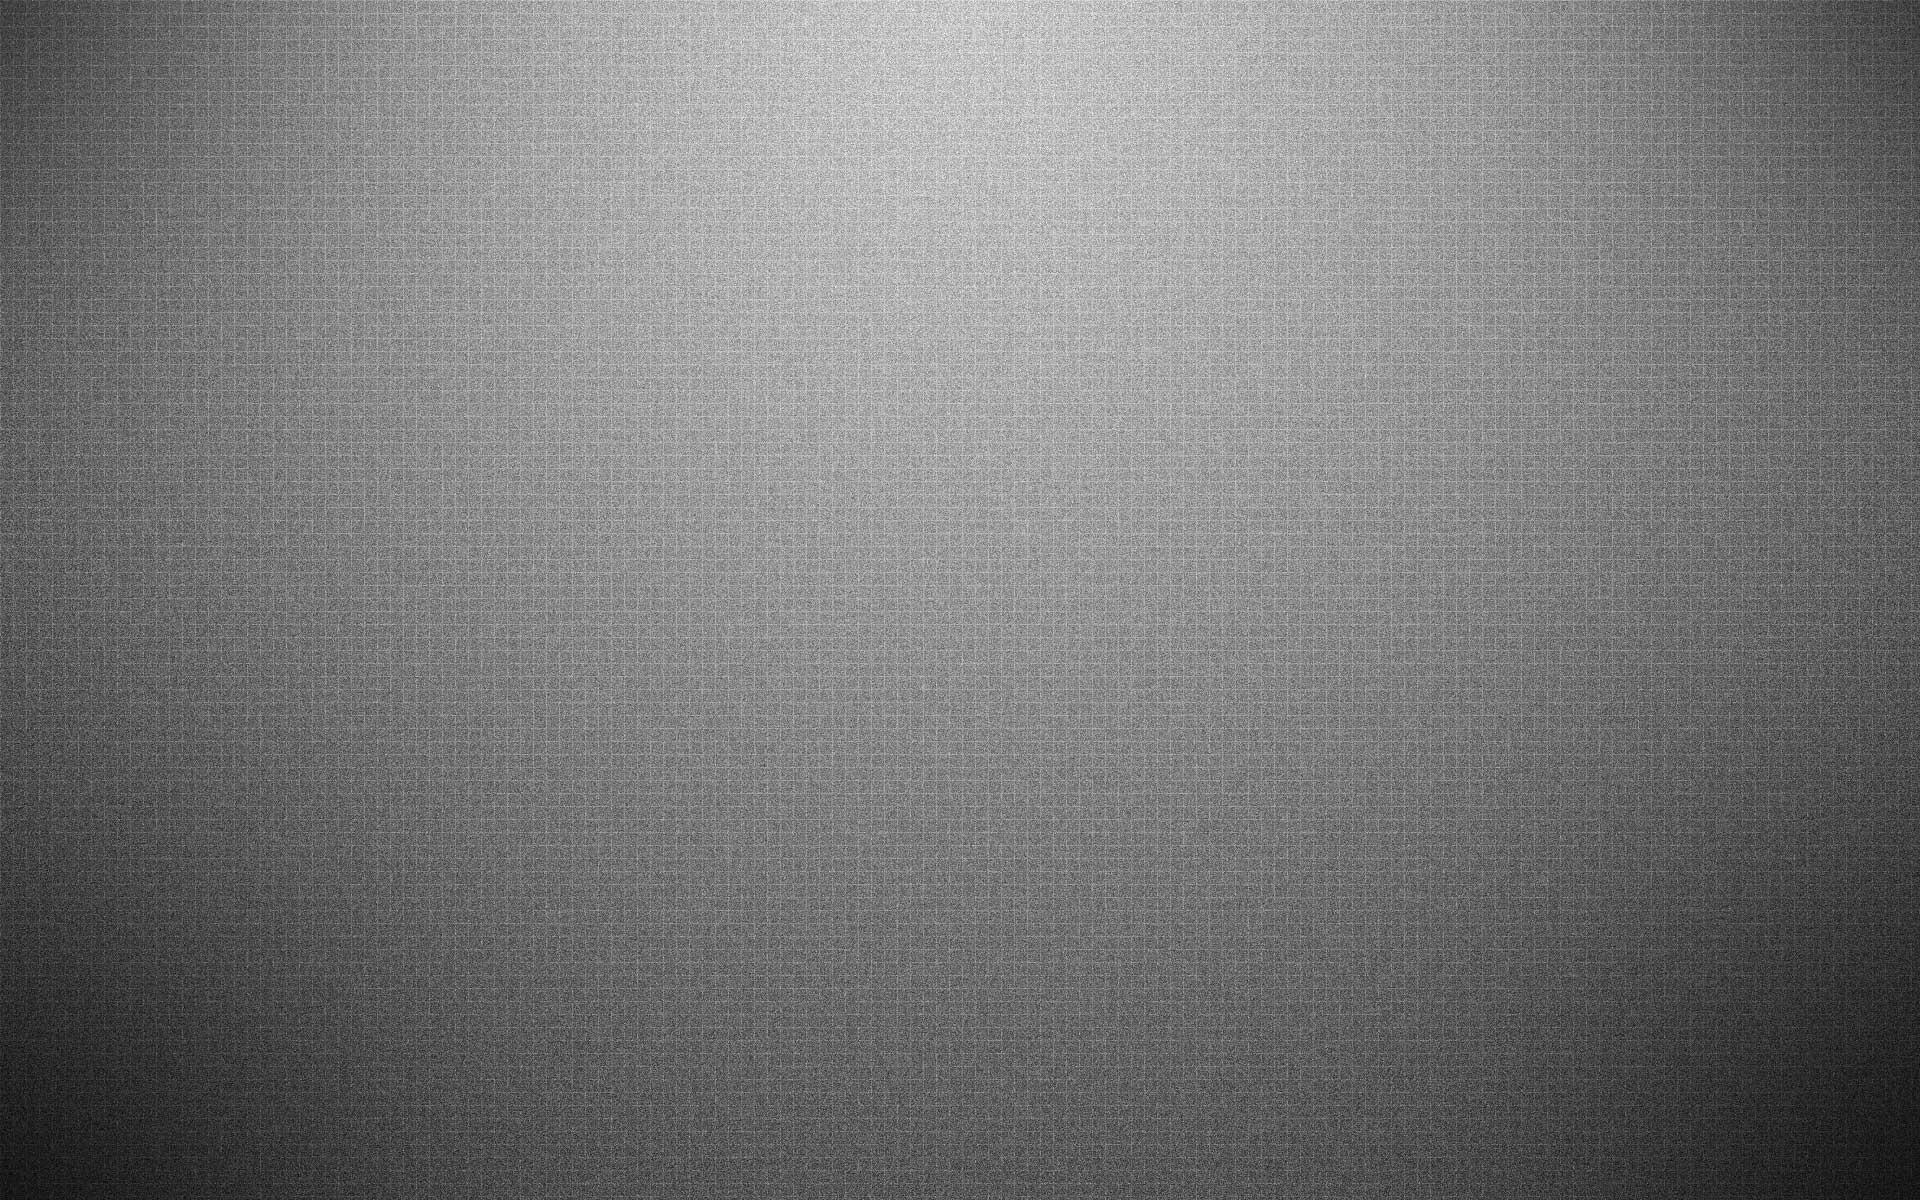 grey backgrounds marketing wallpaper 63 images